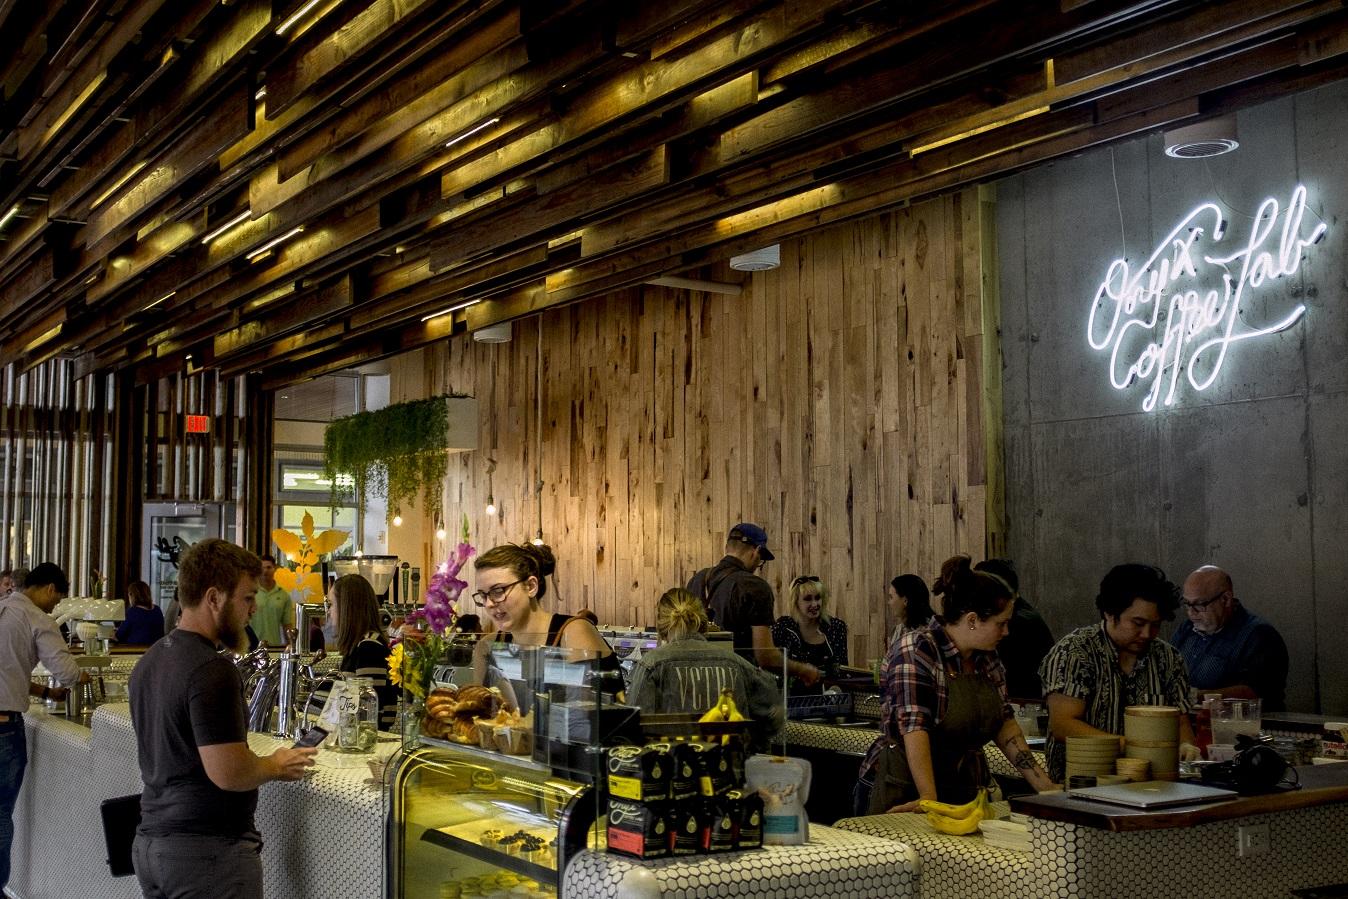 National Coffee Day - Onyx Coffee Lab